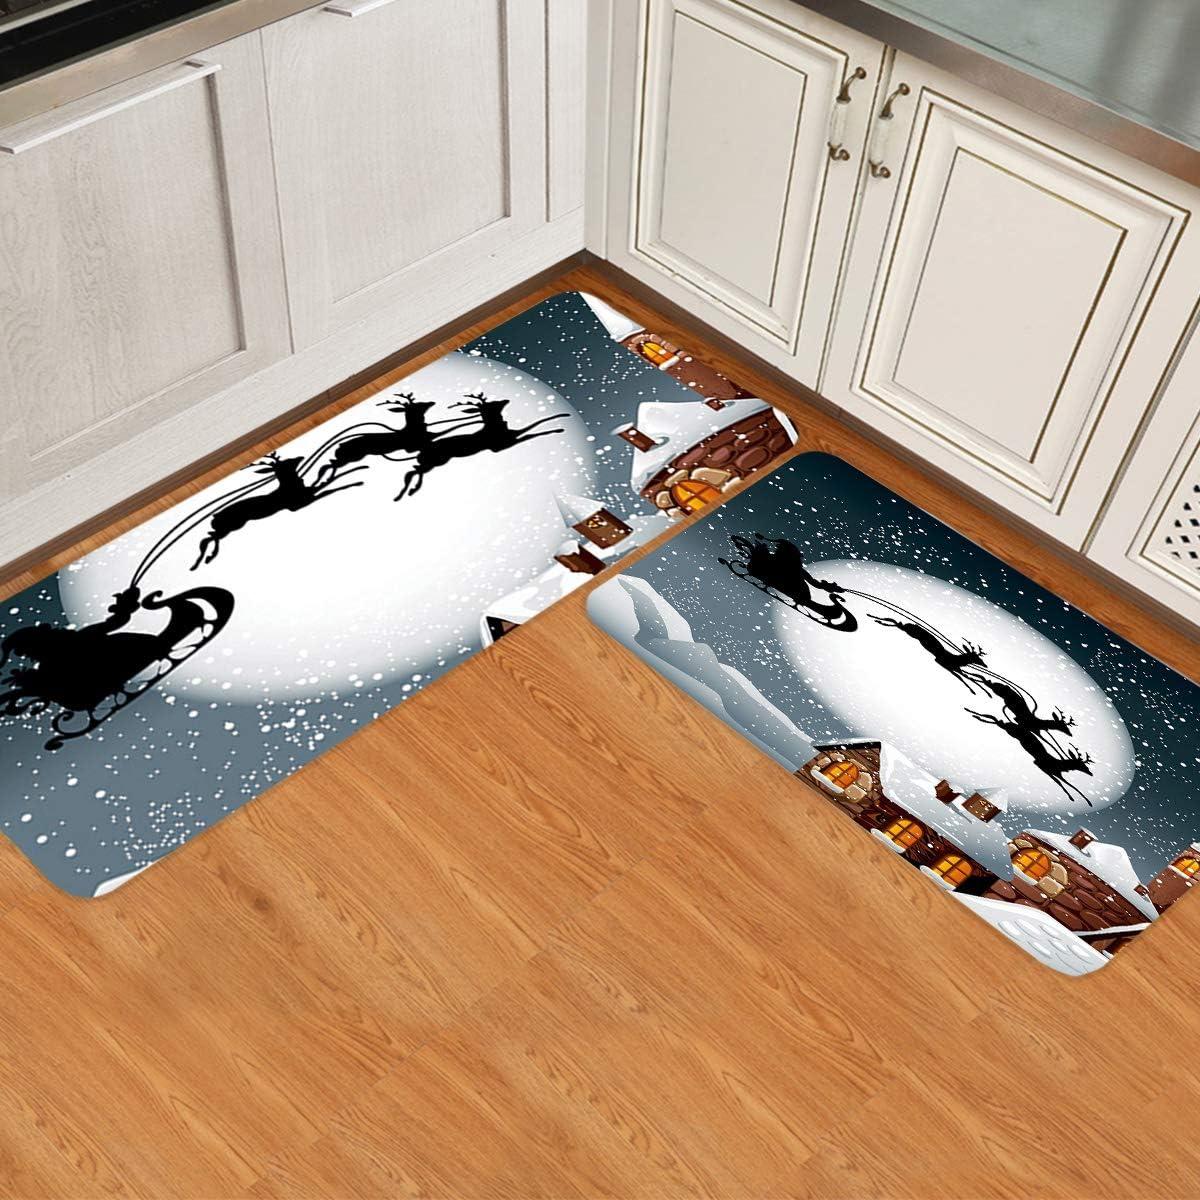 Max 42% OFF Prime Leader 2 Piece Non-Slip Kitchen trust Rug Set Doormat Runner Mat